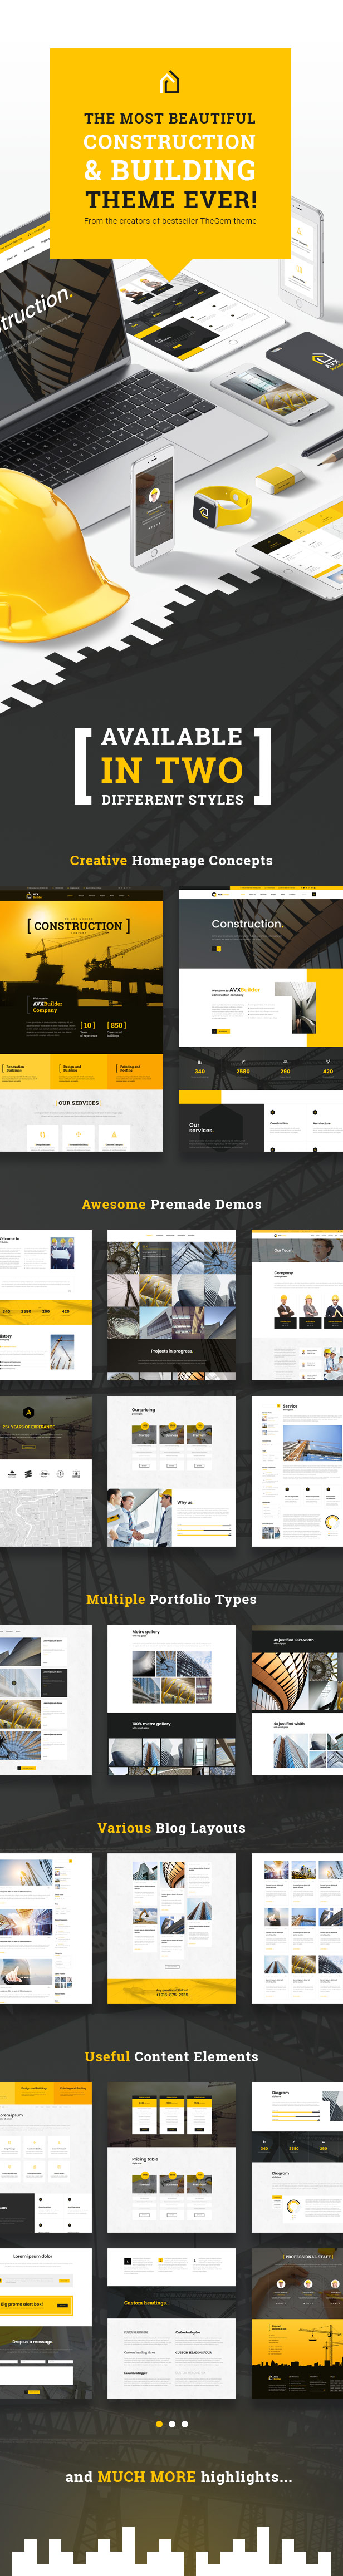 AVXBuilder - Construction Business WordPress Theme - 1